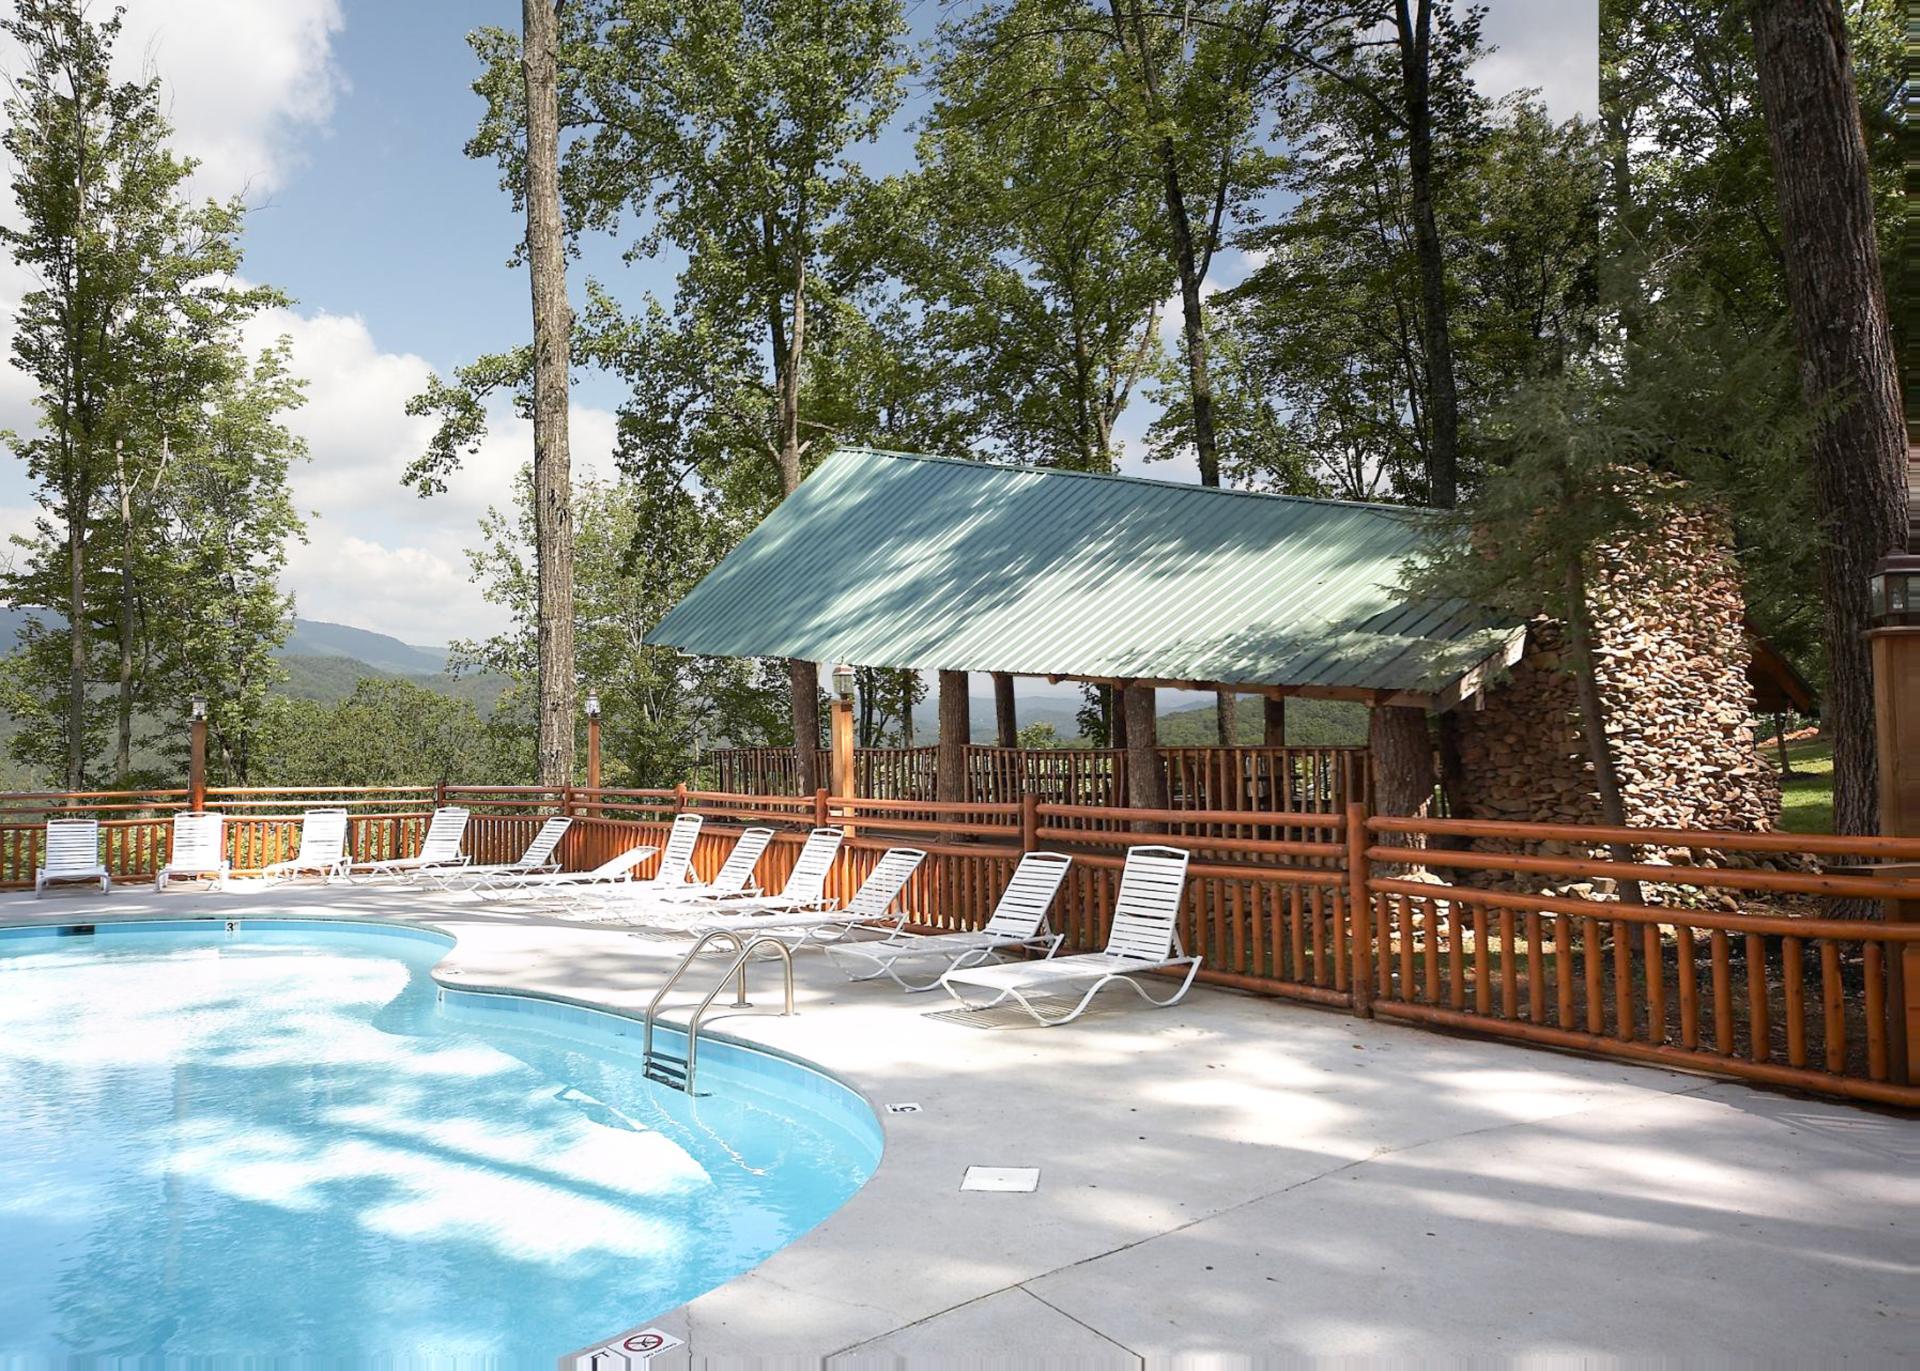 cabins frio lodging hot back with tubs louisiana hacienda rio tub in la deck